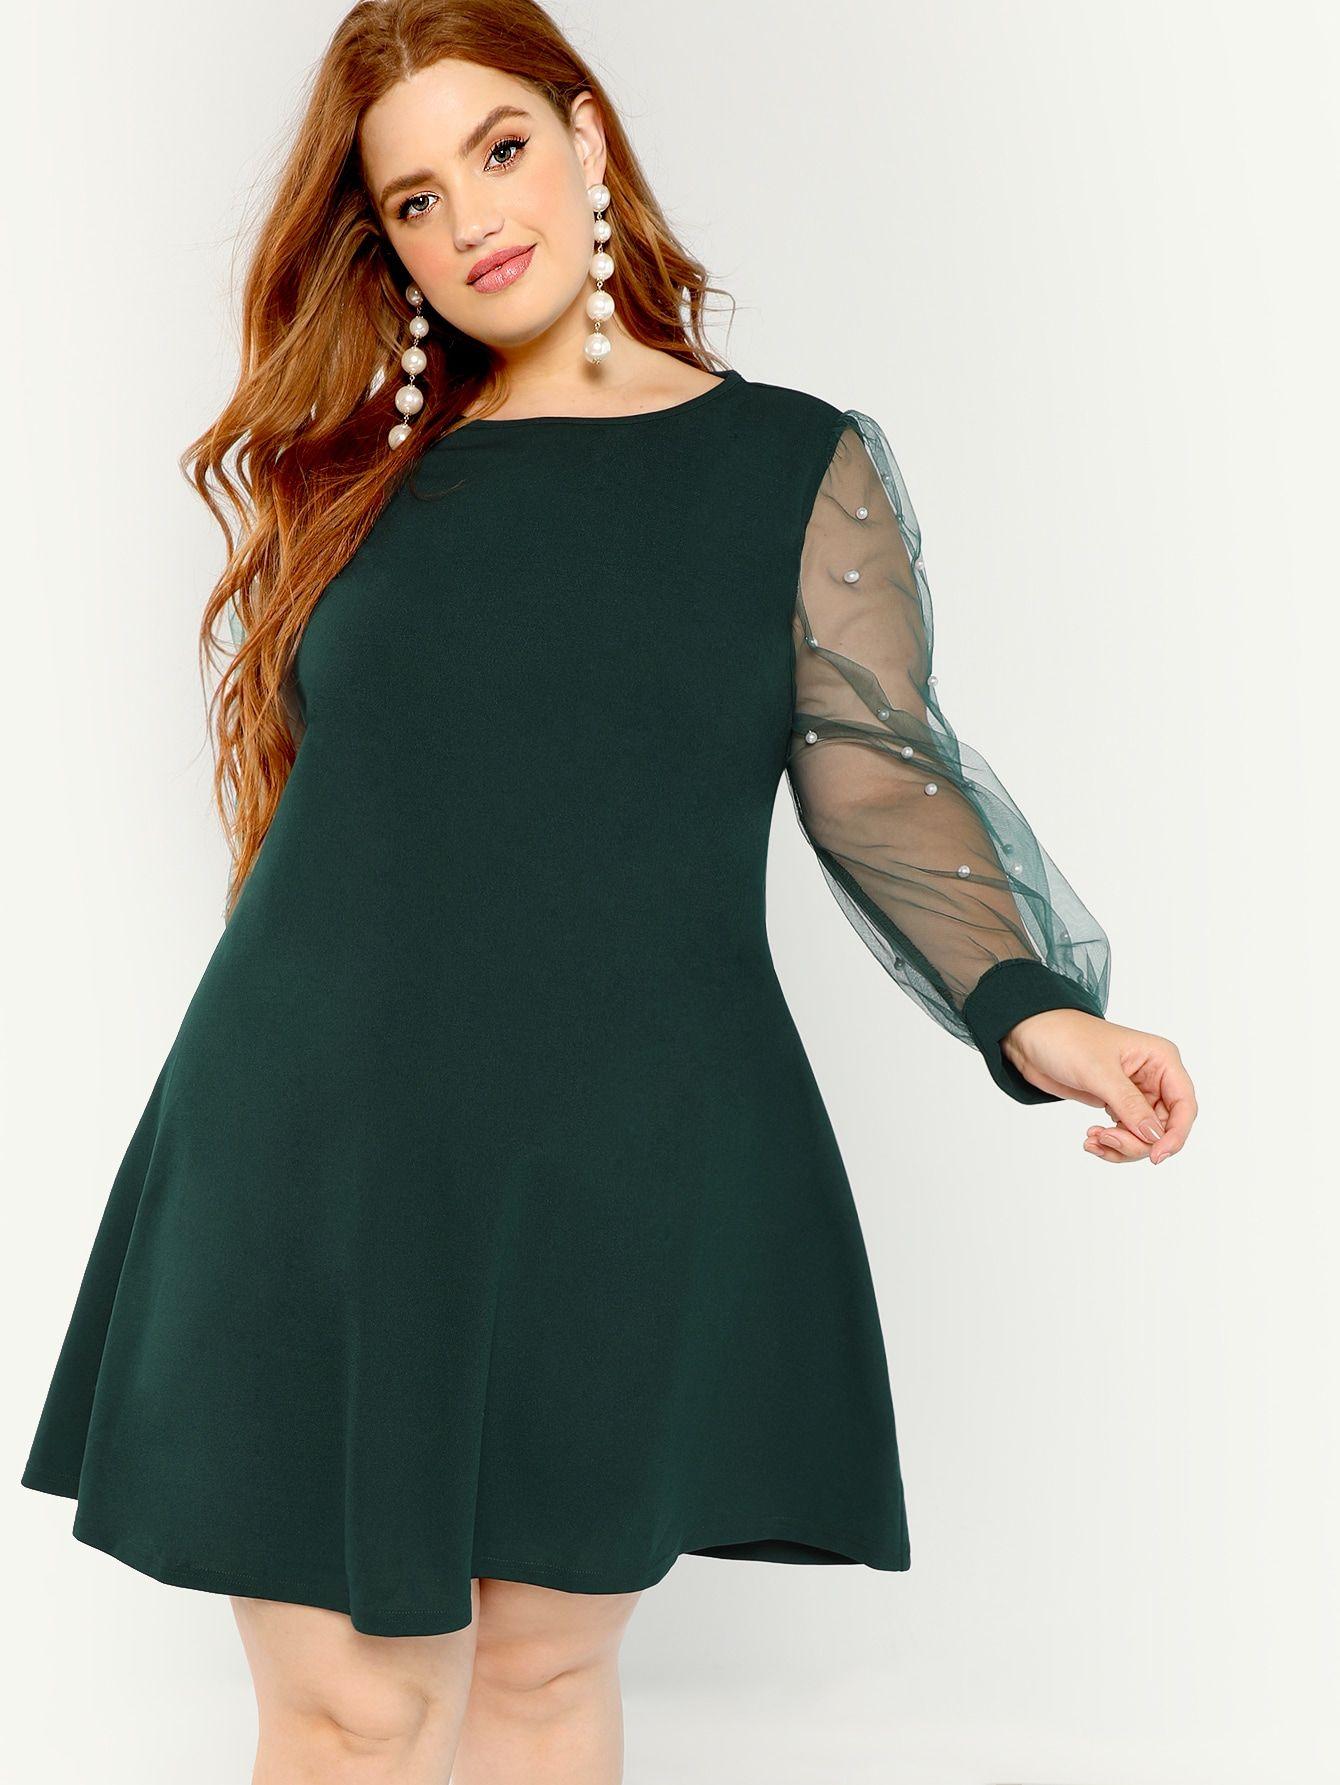 05190d0c04b8 Plus Pearl Beading Mesh Sleeve Dress -SheIn(Sheinside) | Bree Kish ...